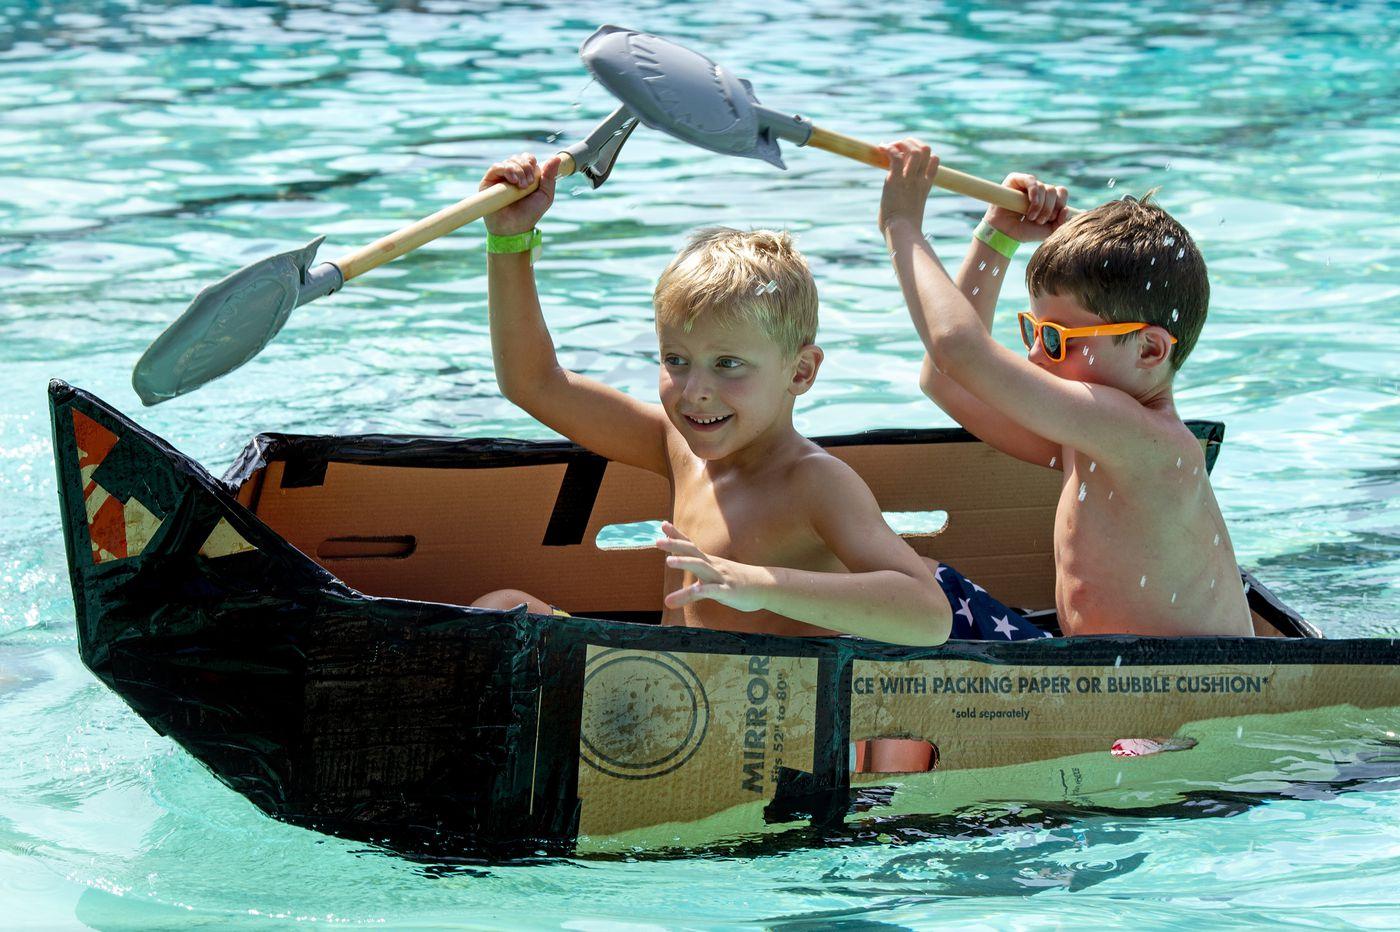 Cardboard boat regatta closed out summer pool season in Ridley Park